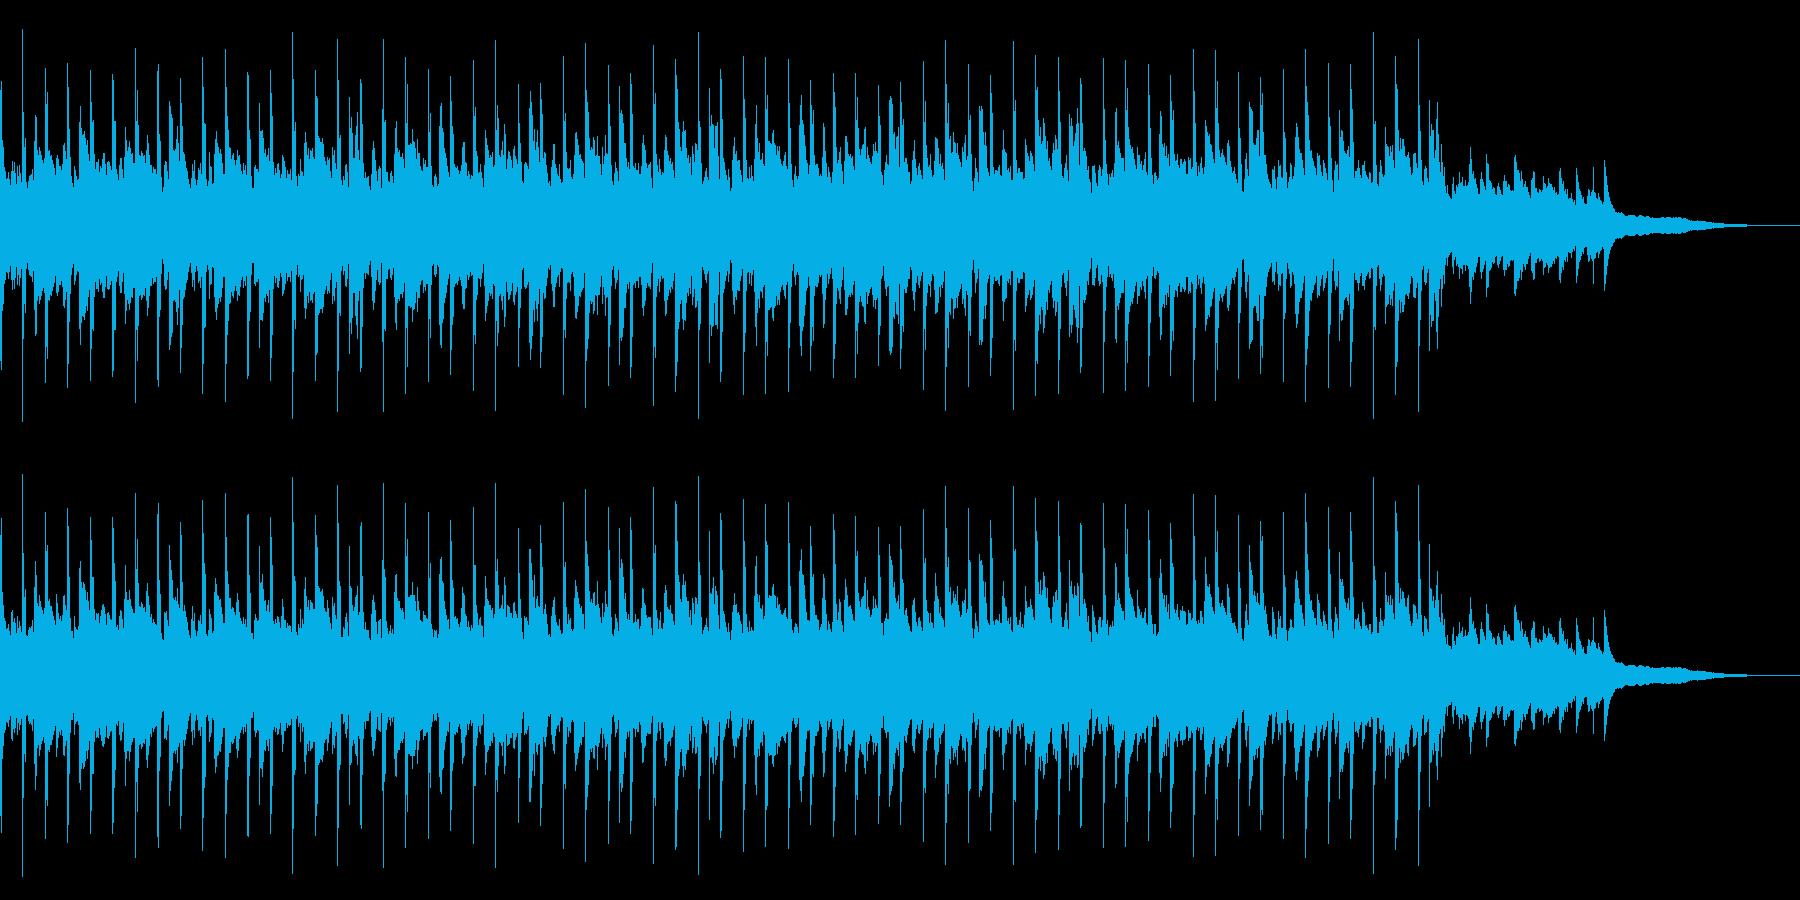 CM用BGM(ピアノアルペジオ+シンセ)の再生済みの波形